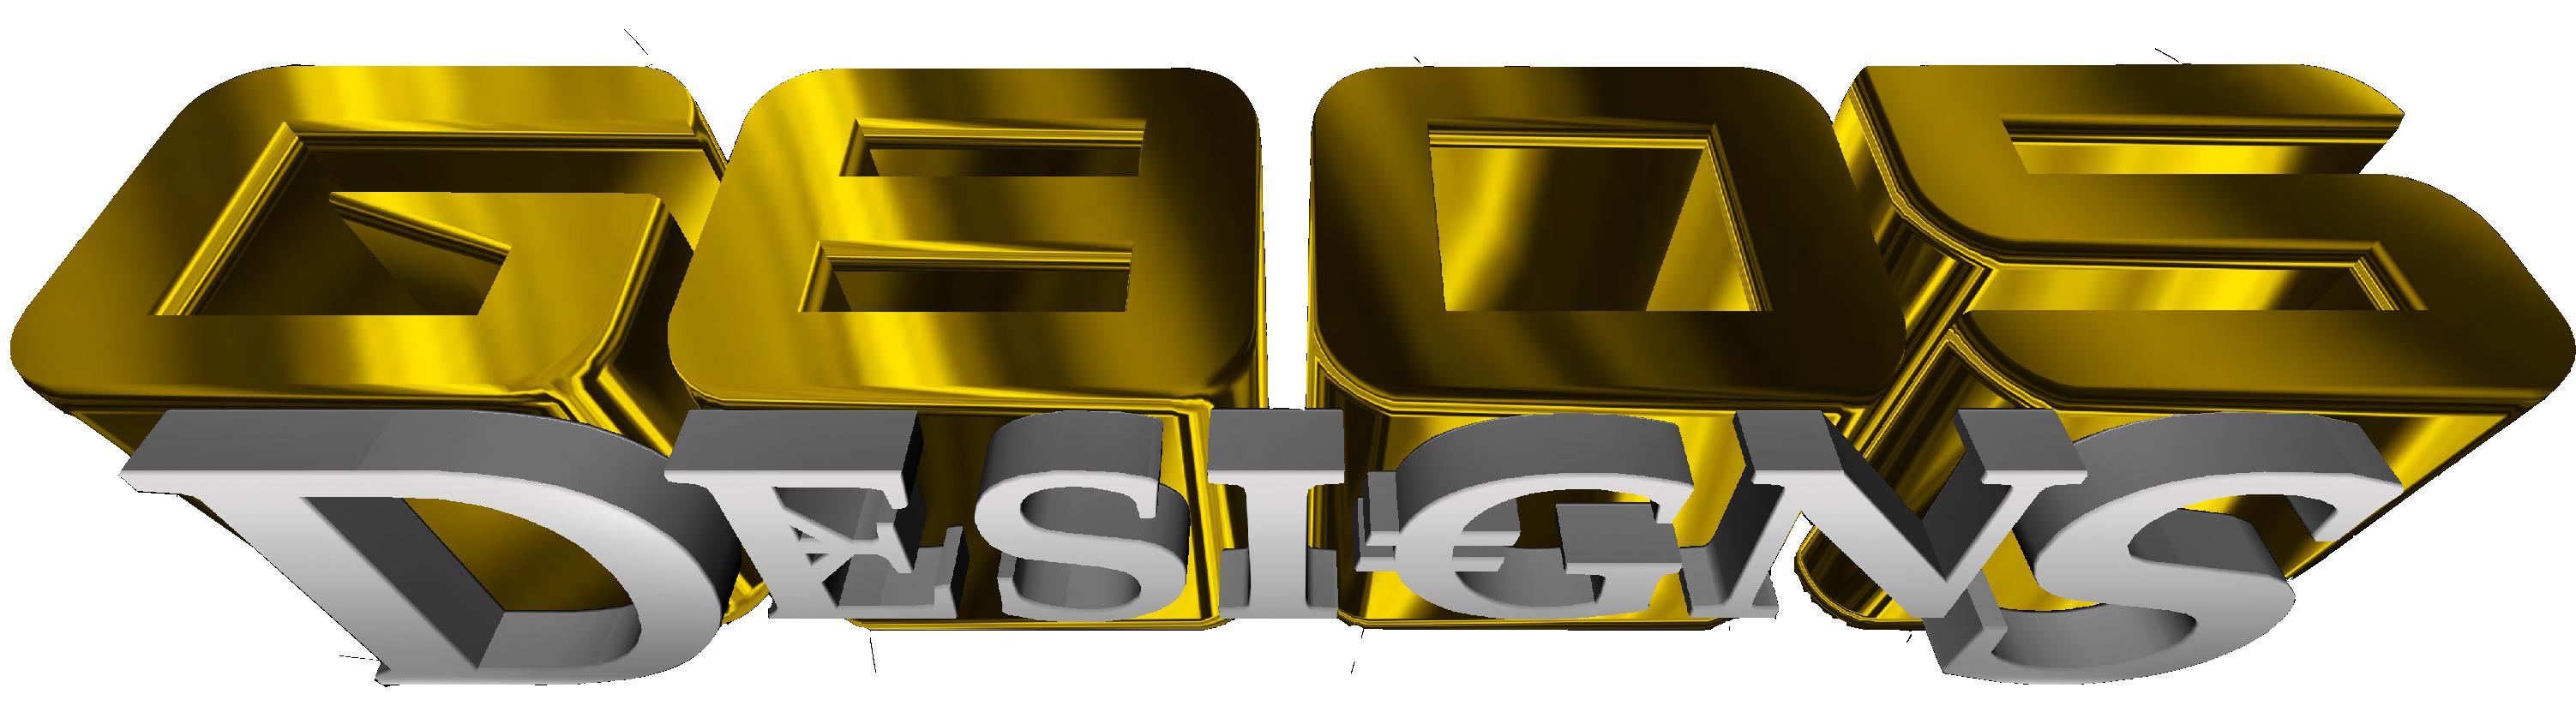 G805 Designs Shop